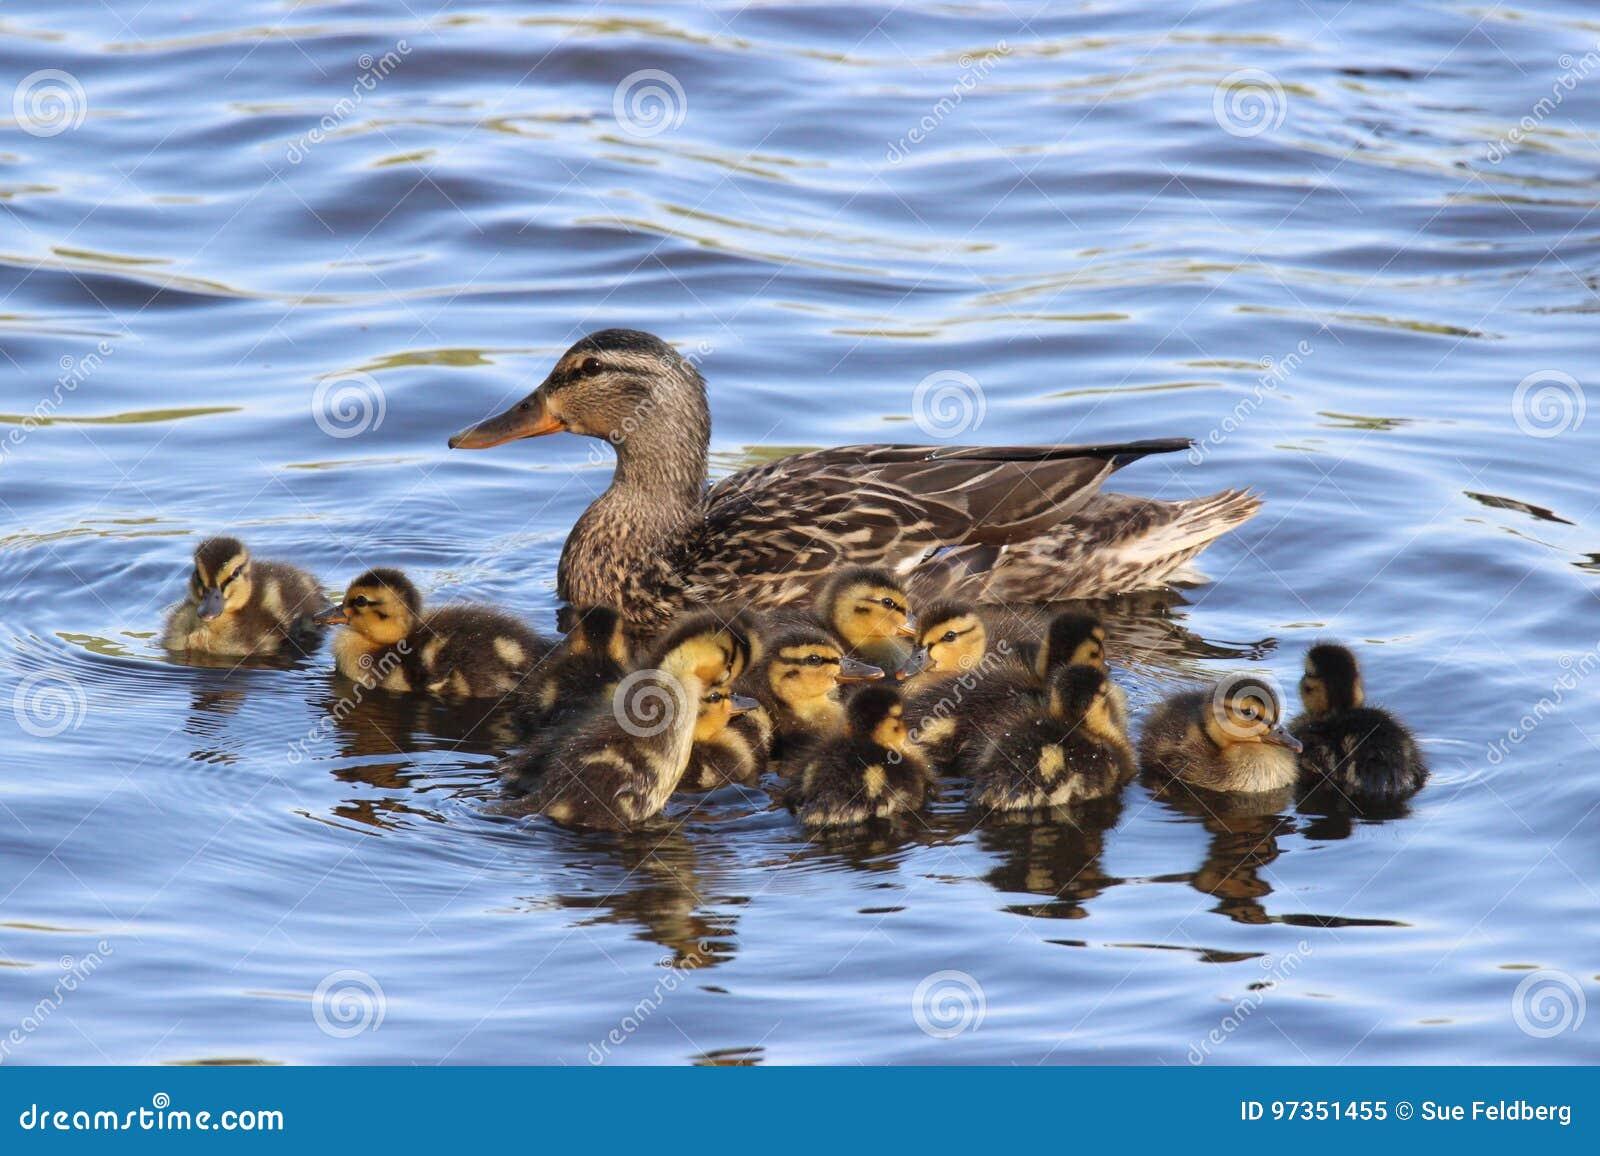 Mallard Duck Family Group